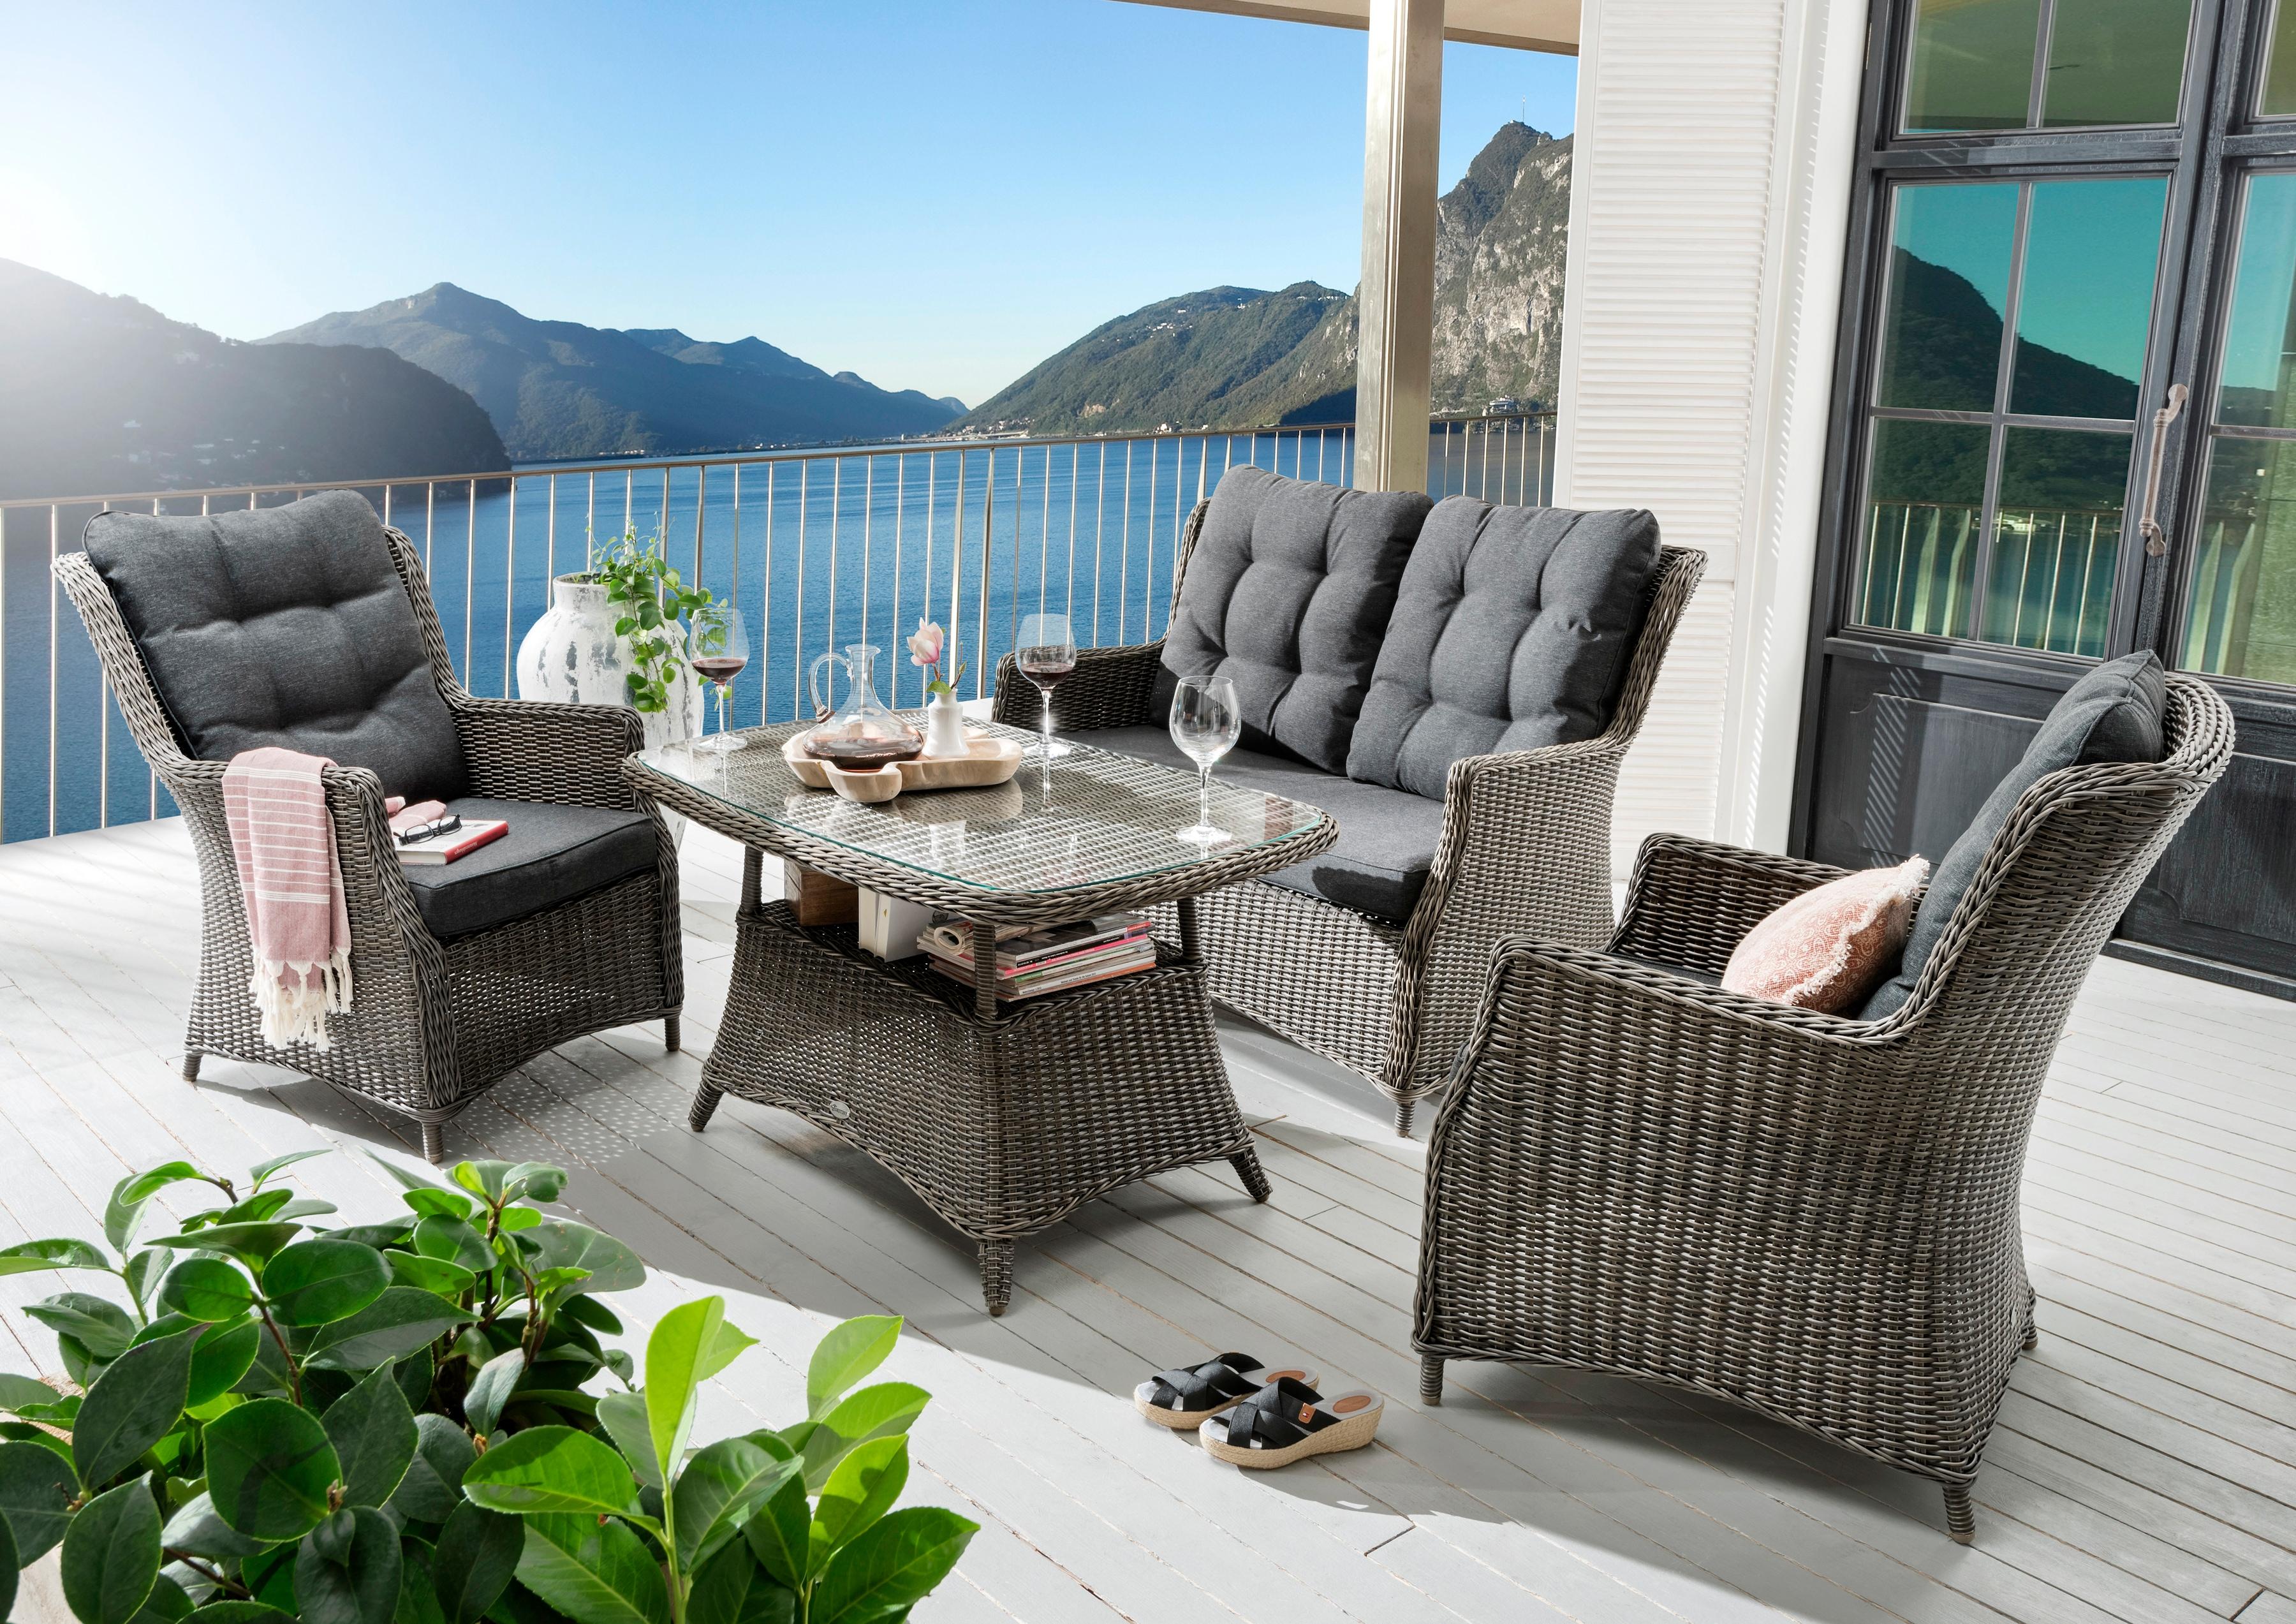 DESTINY Gartenmöbelset Casa 11-tlg 2 Sessel 2er-Sofa Tisch 120x75 cm Polyrattan